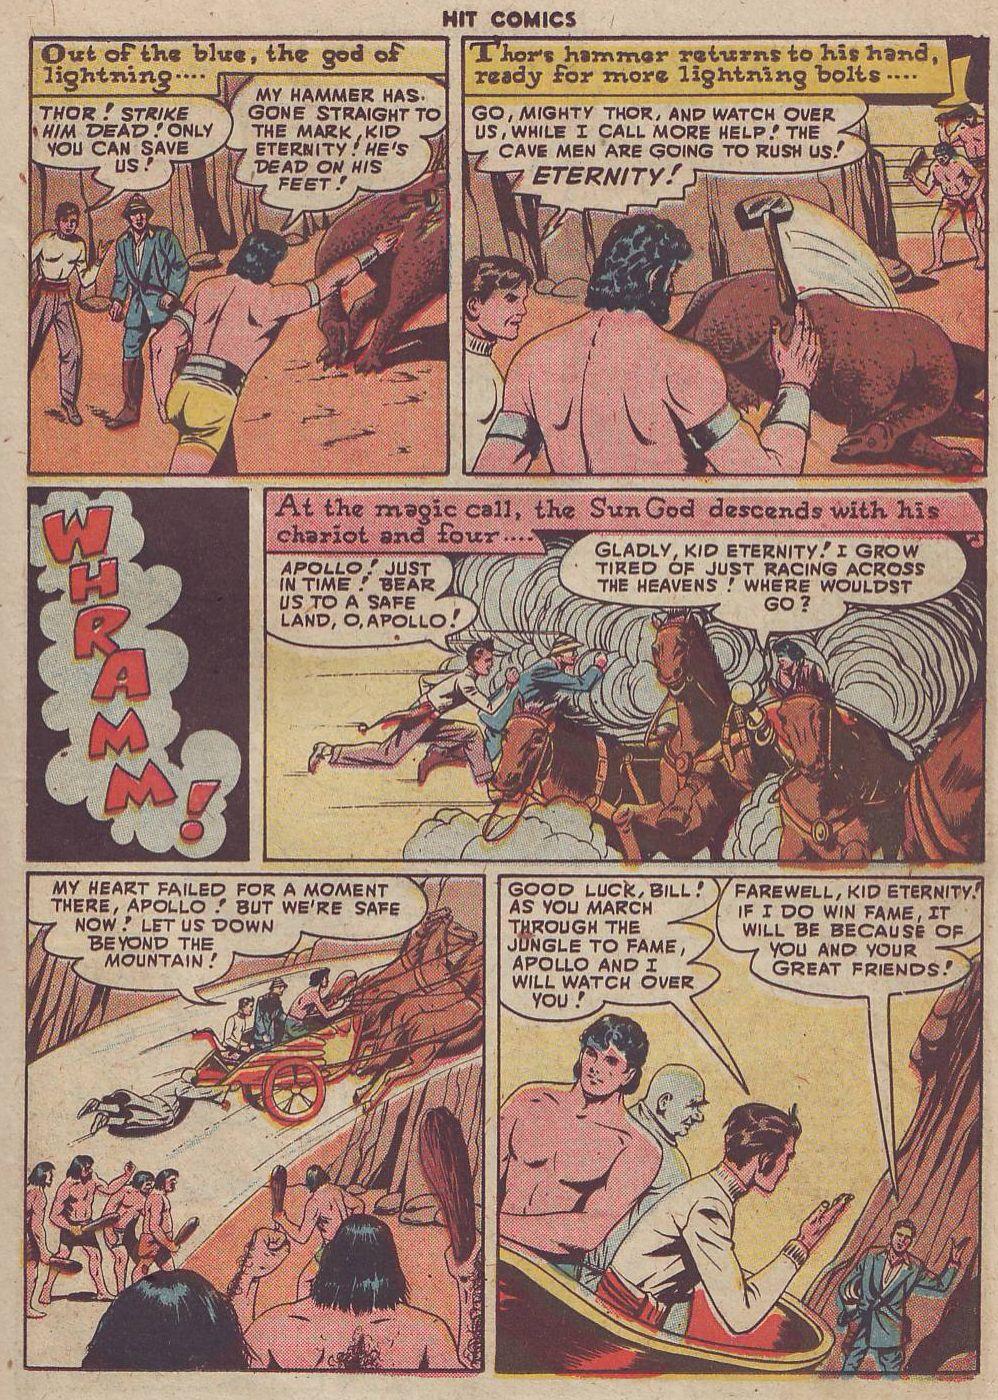 Read online Hit Comics comic -  Issue #51 - 15